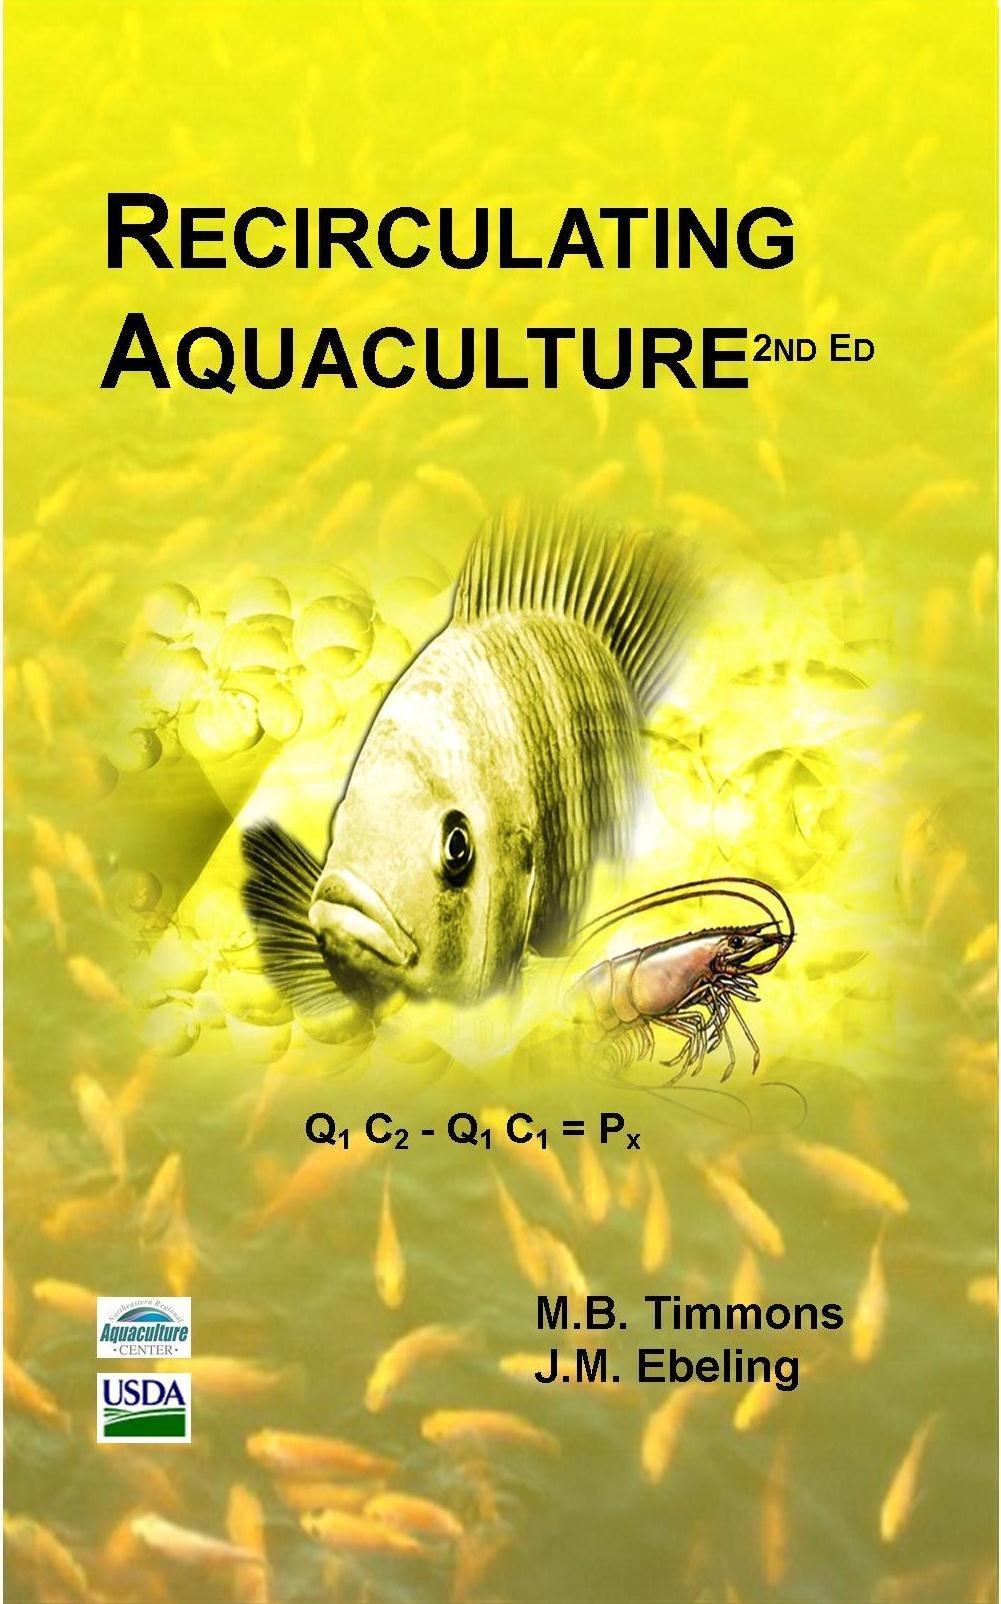 Recirculating Aquaculture: M B  Timmons and J M  Ebeling